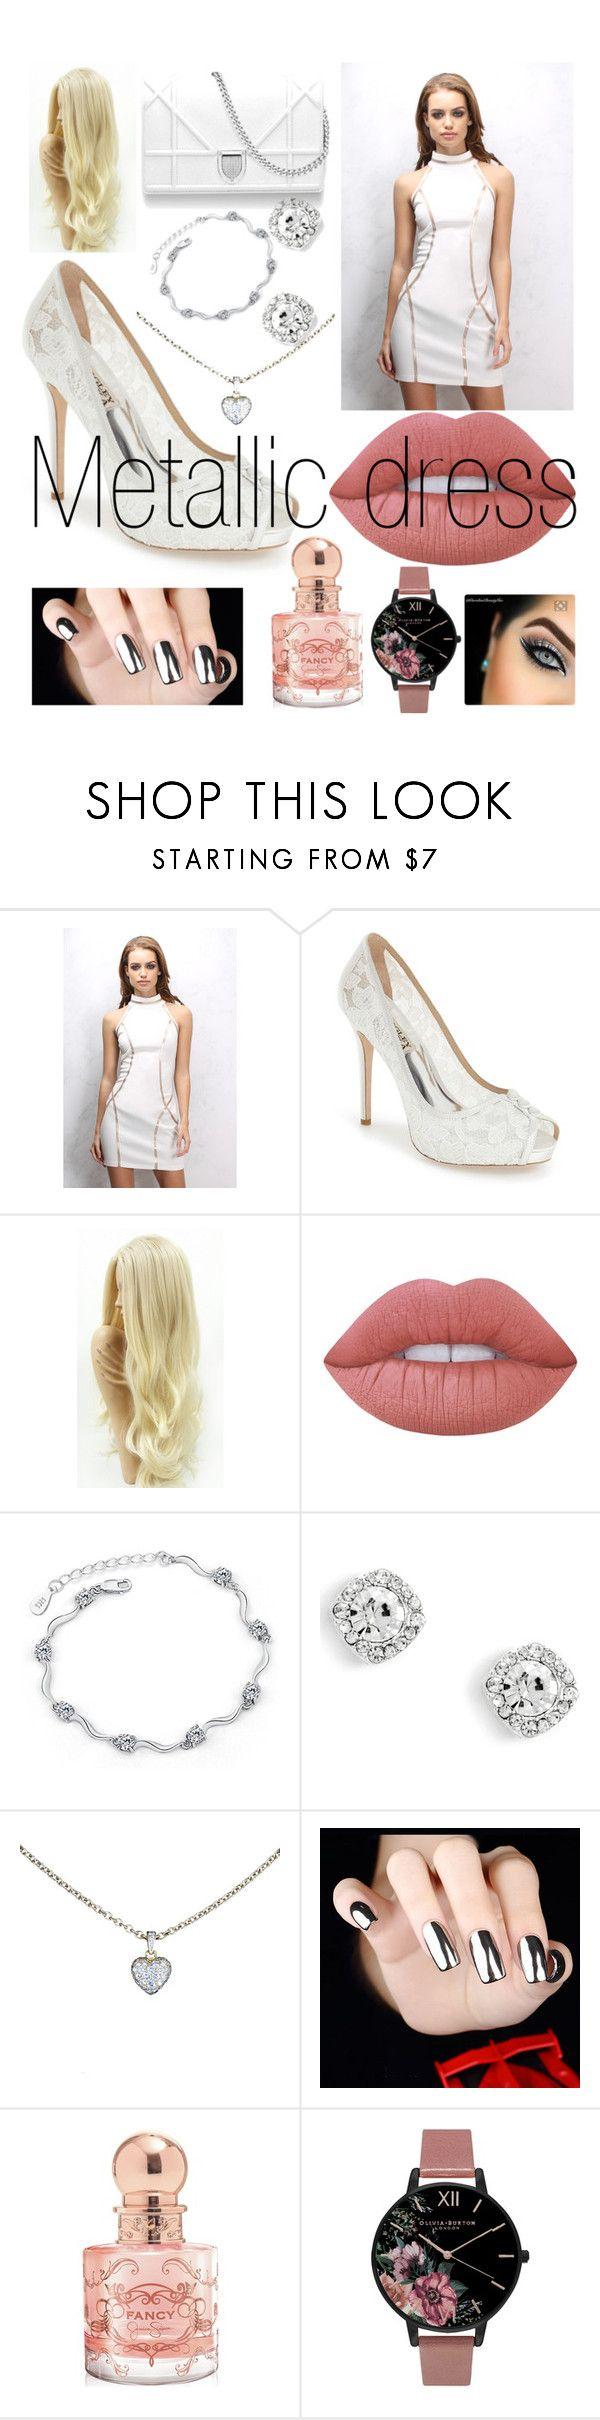 """Metallic dress"" by maryamsaeed1 ❤ liked on Polyvore featuring Rare London, Badgley Mischka, Lime Crime, Cartier, Jessica Simpson and Olivia Burton"